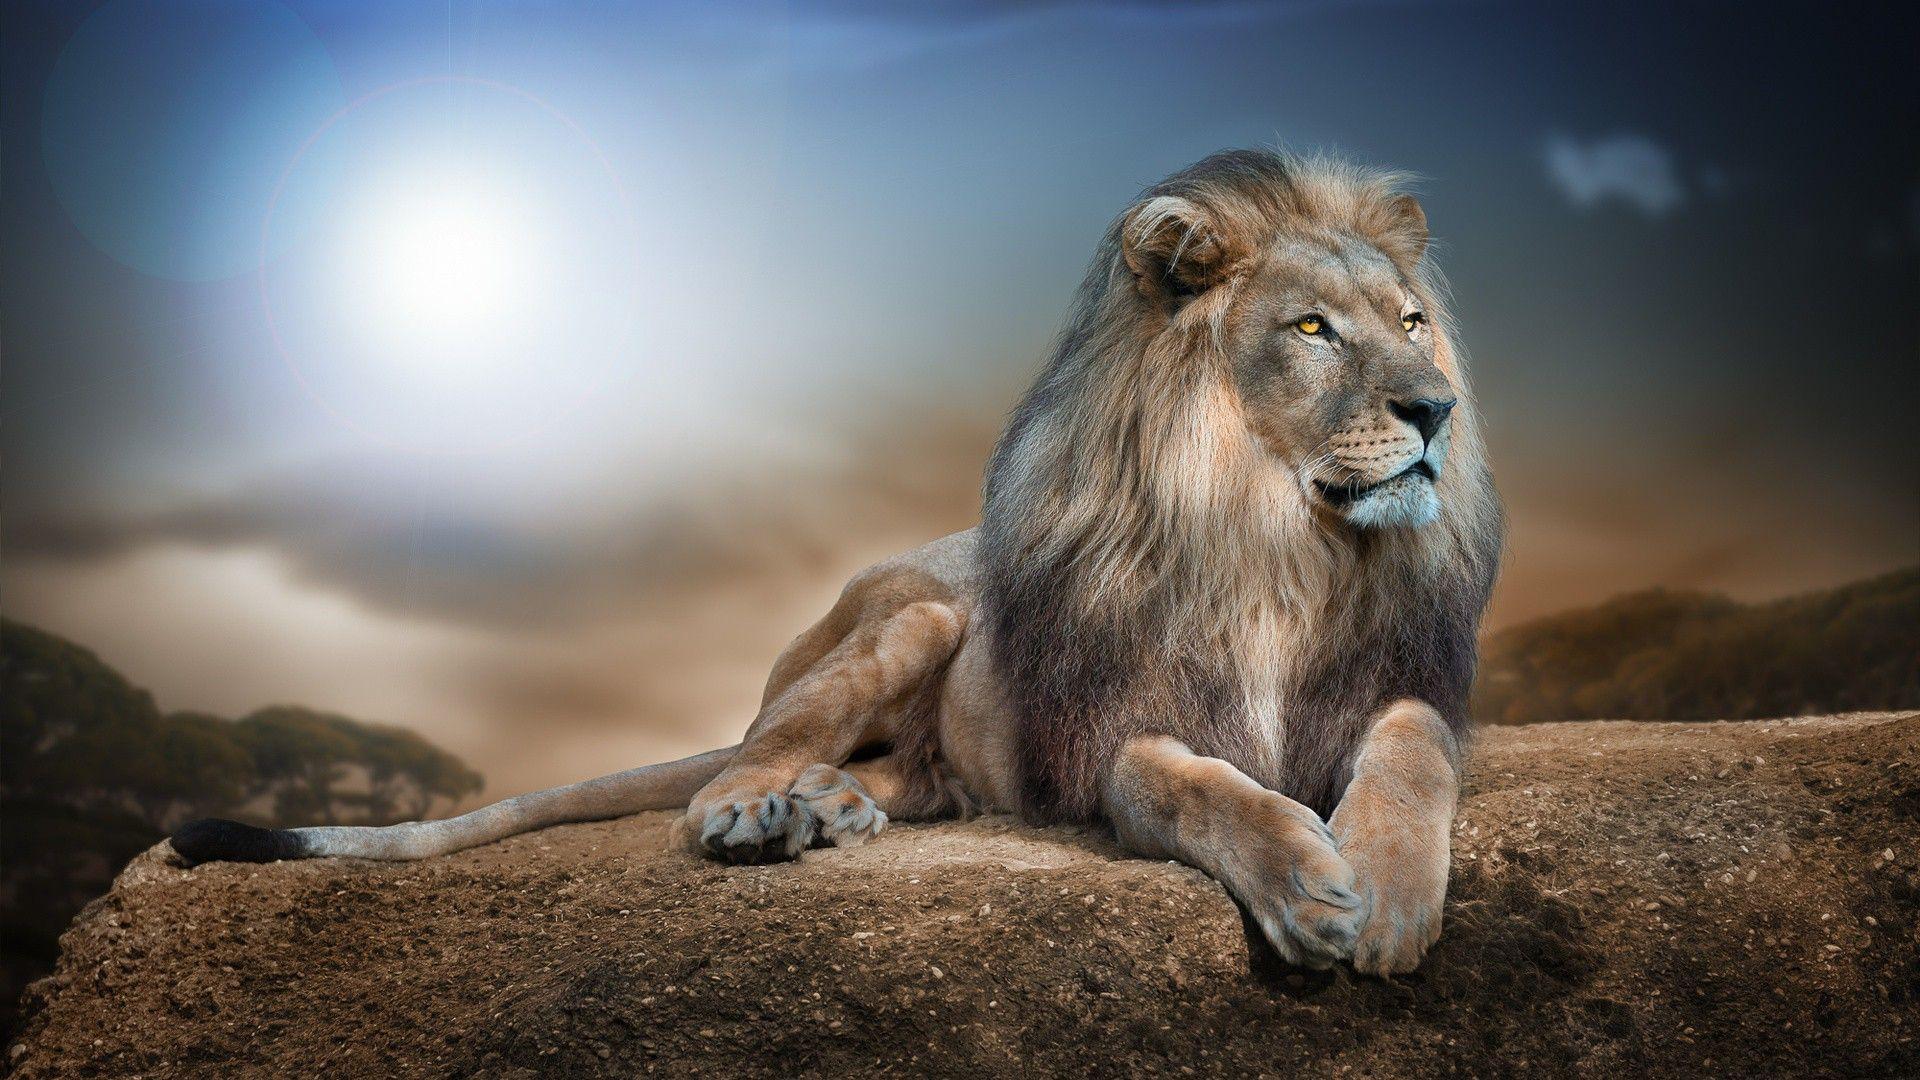 Wild Animal Lion HD Wallpaper | View HD | Download Wallpaper ...